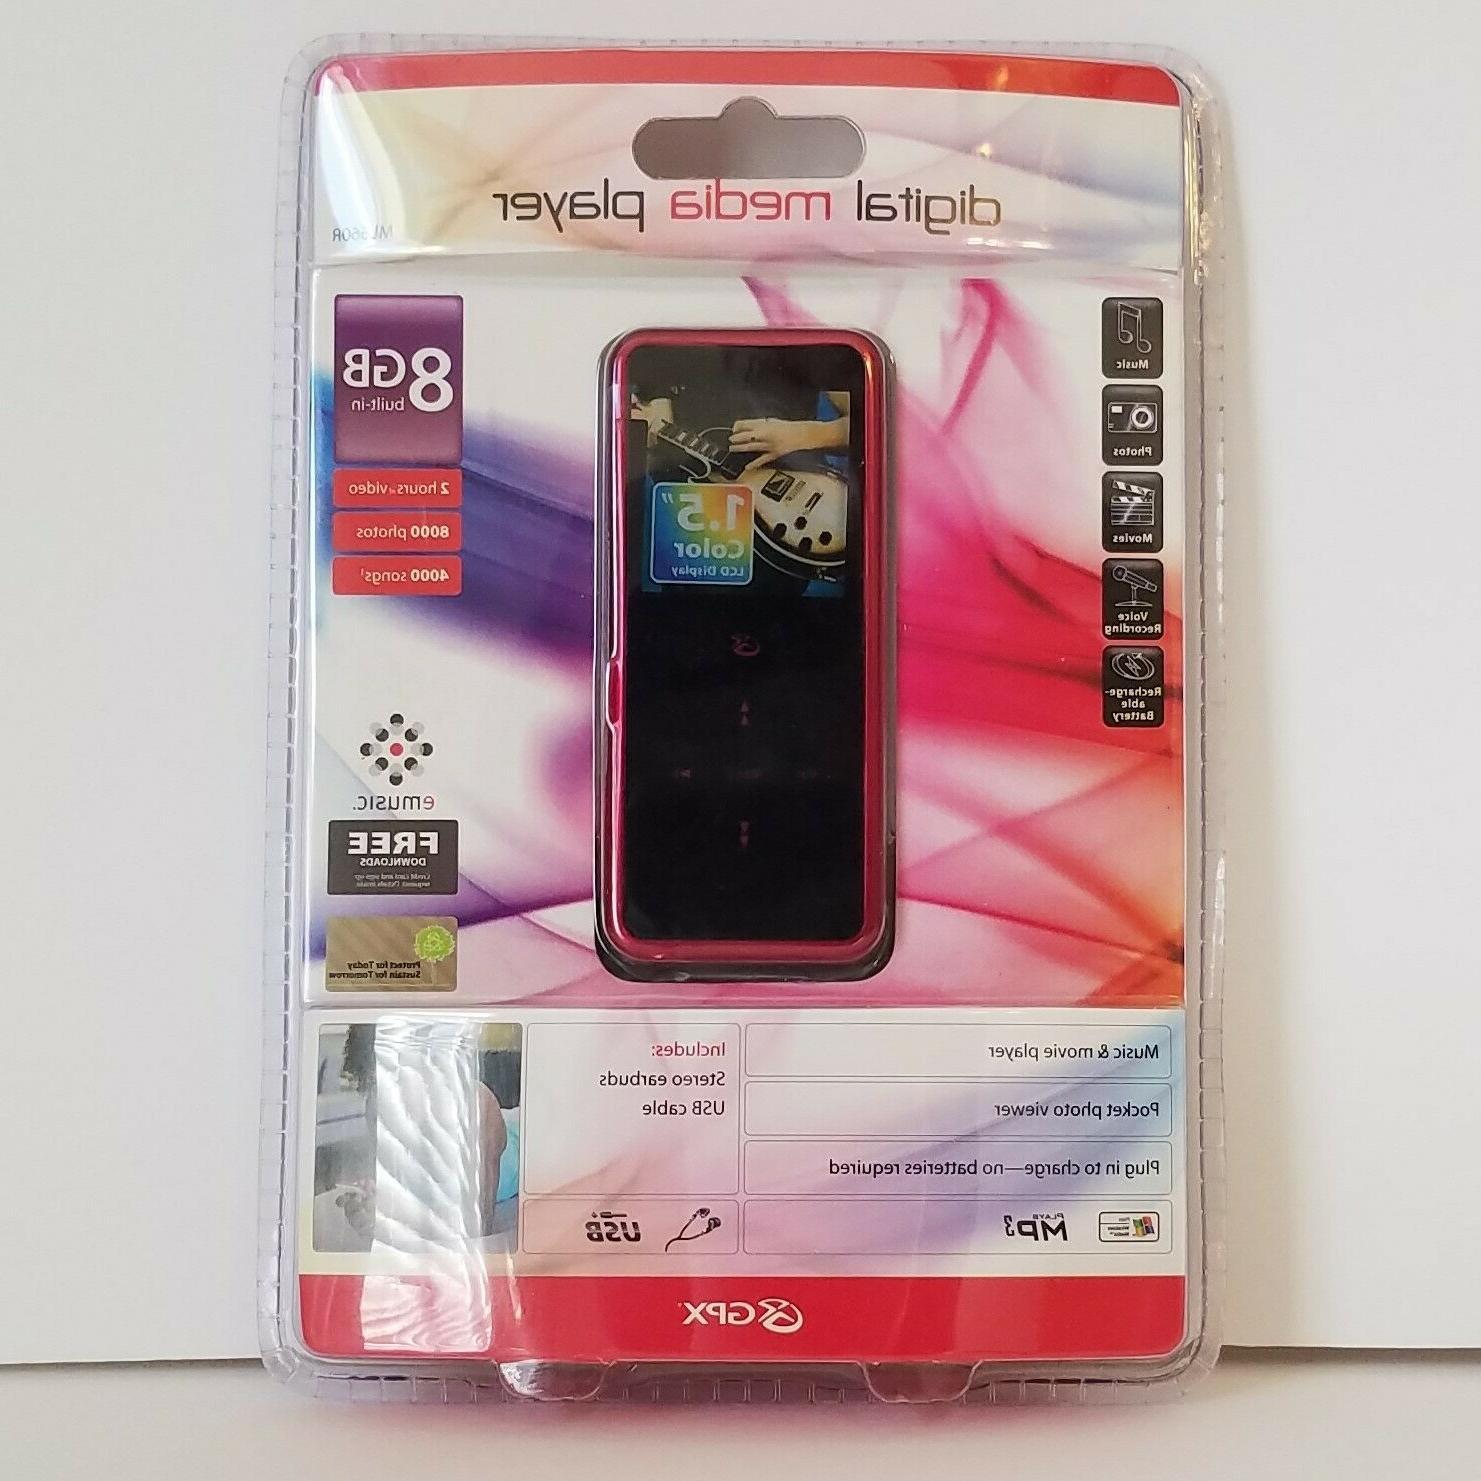 GPX ML660R 8GB Digital Media Player MP3 WMA Video Voice Reco